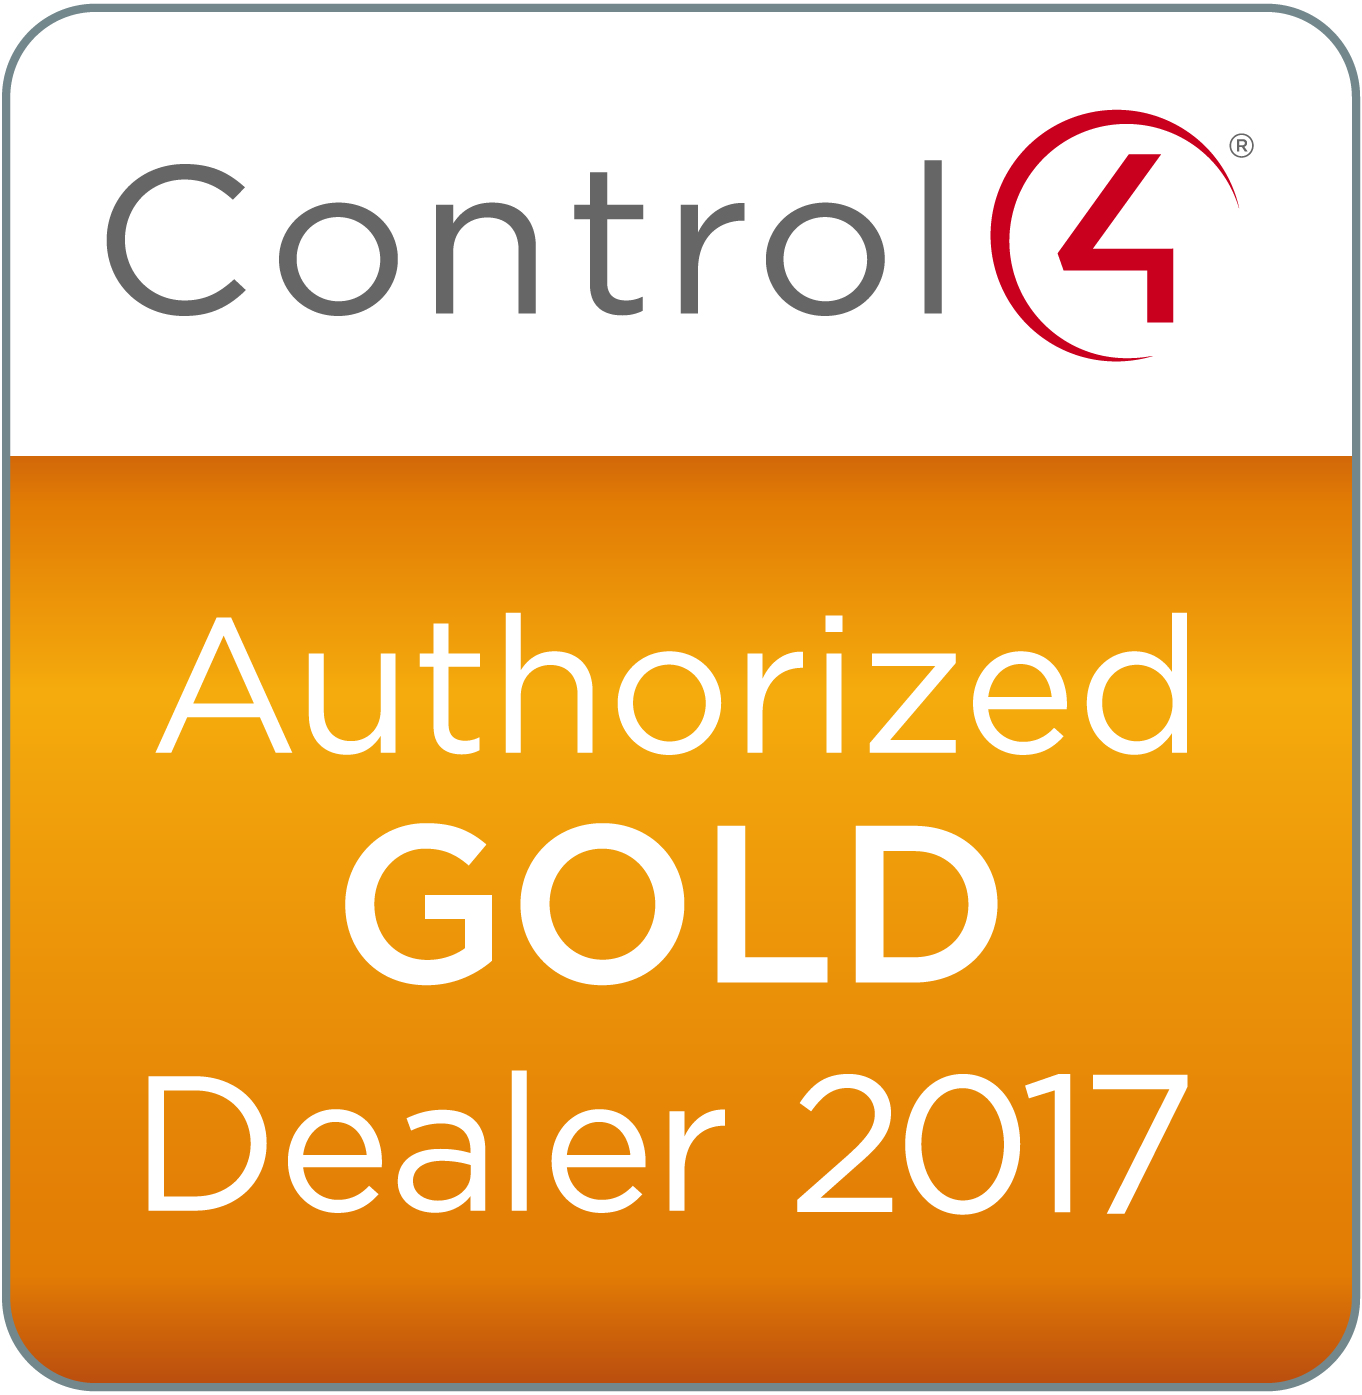 Premier Control4 Dealer - New York